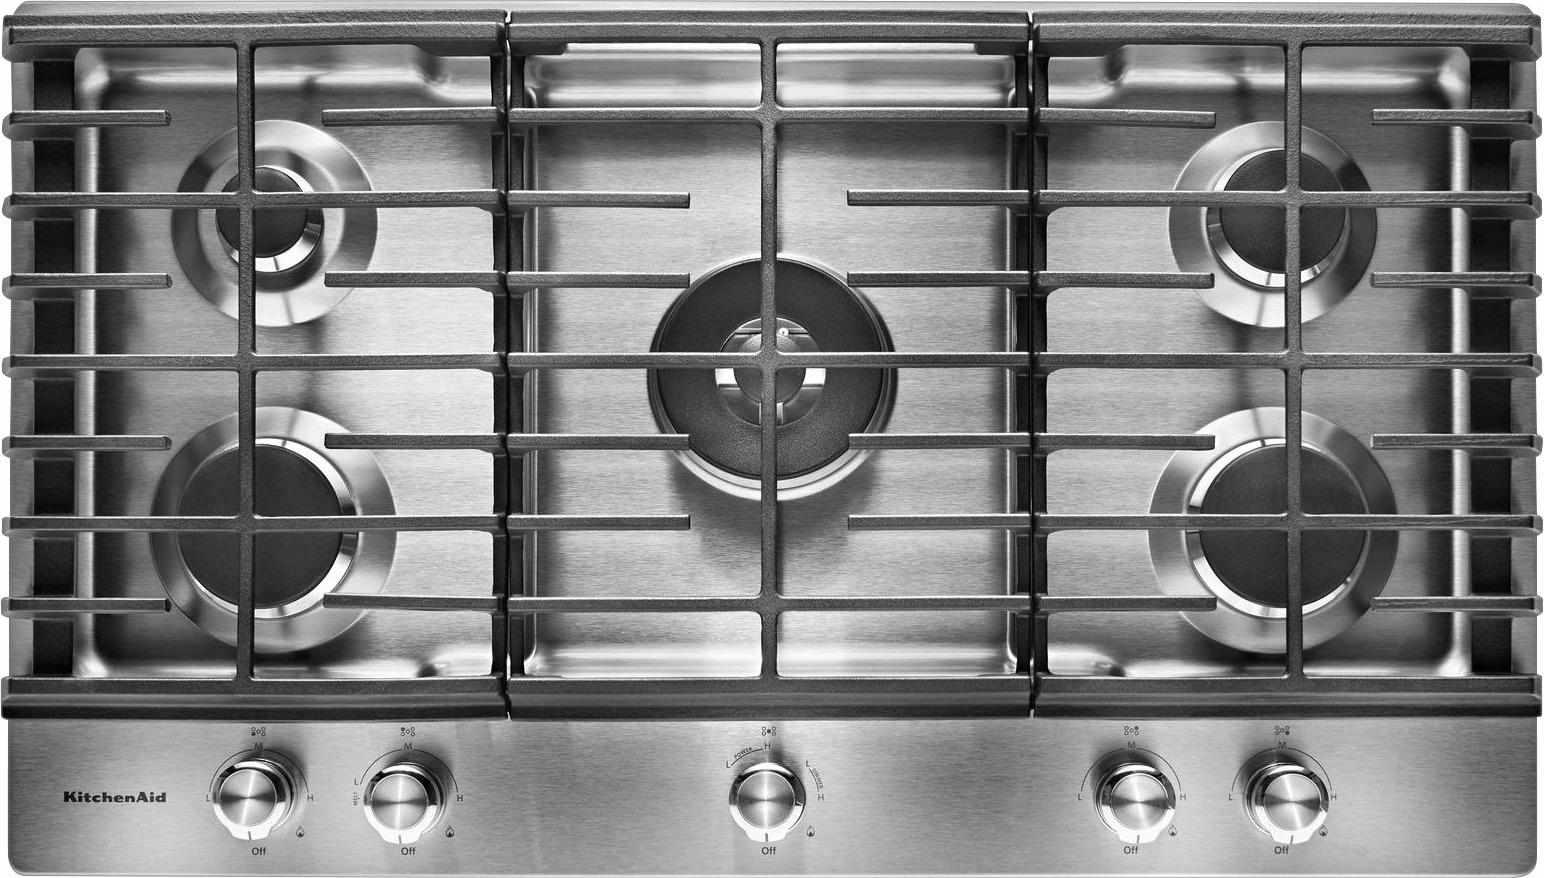 kitchenaid-gas-cooktop